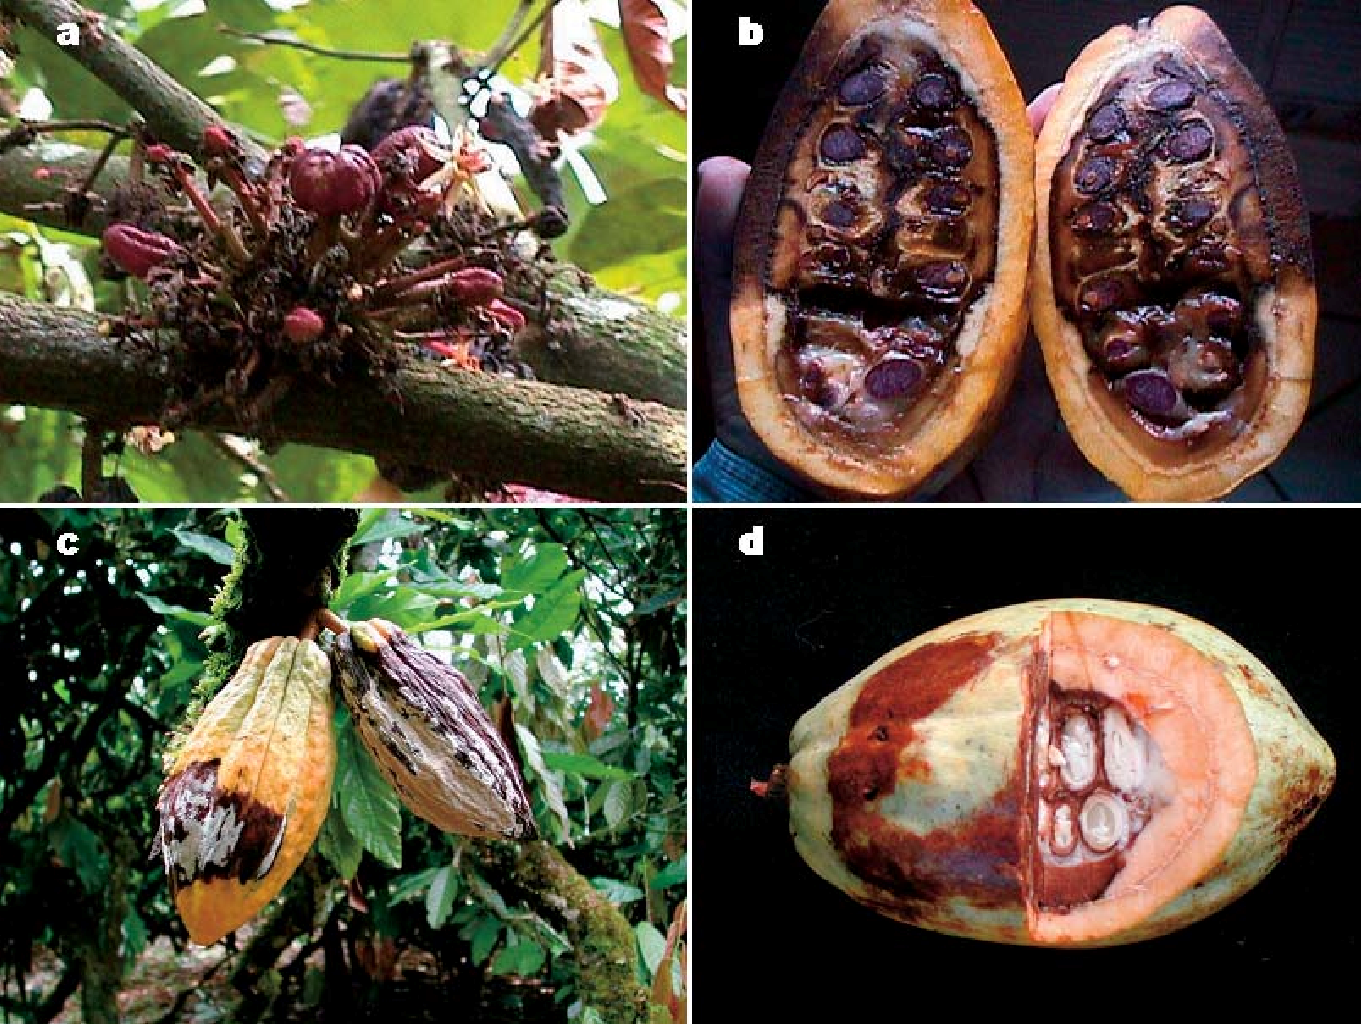 kakao-sjukdomar.png